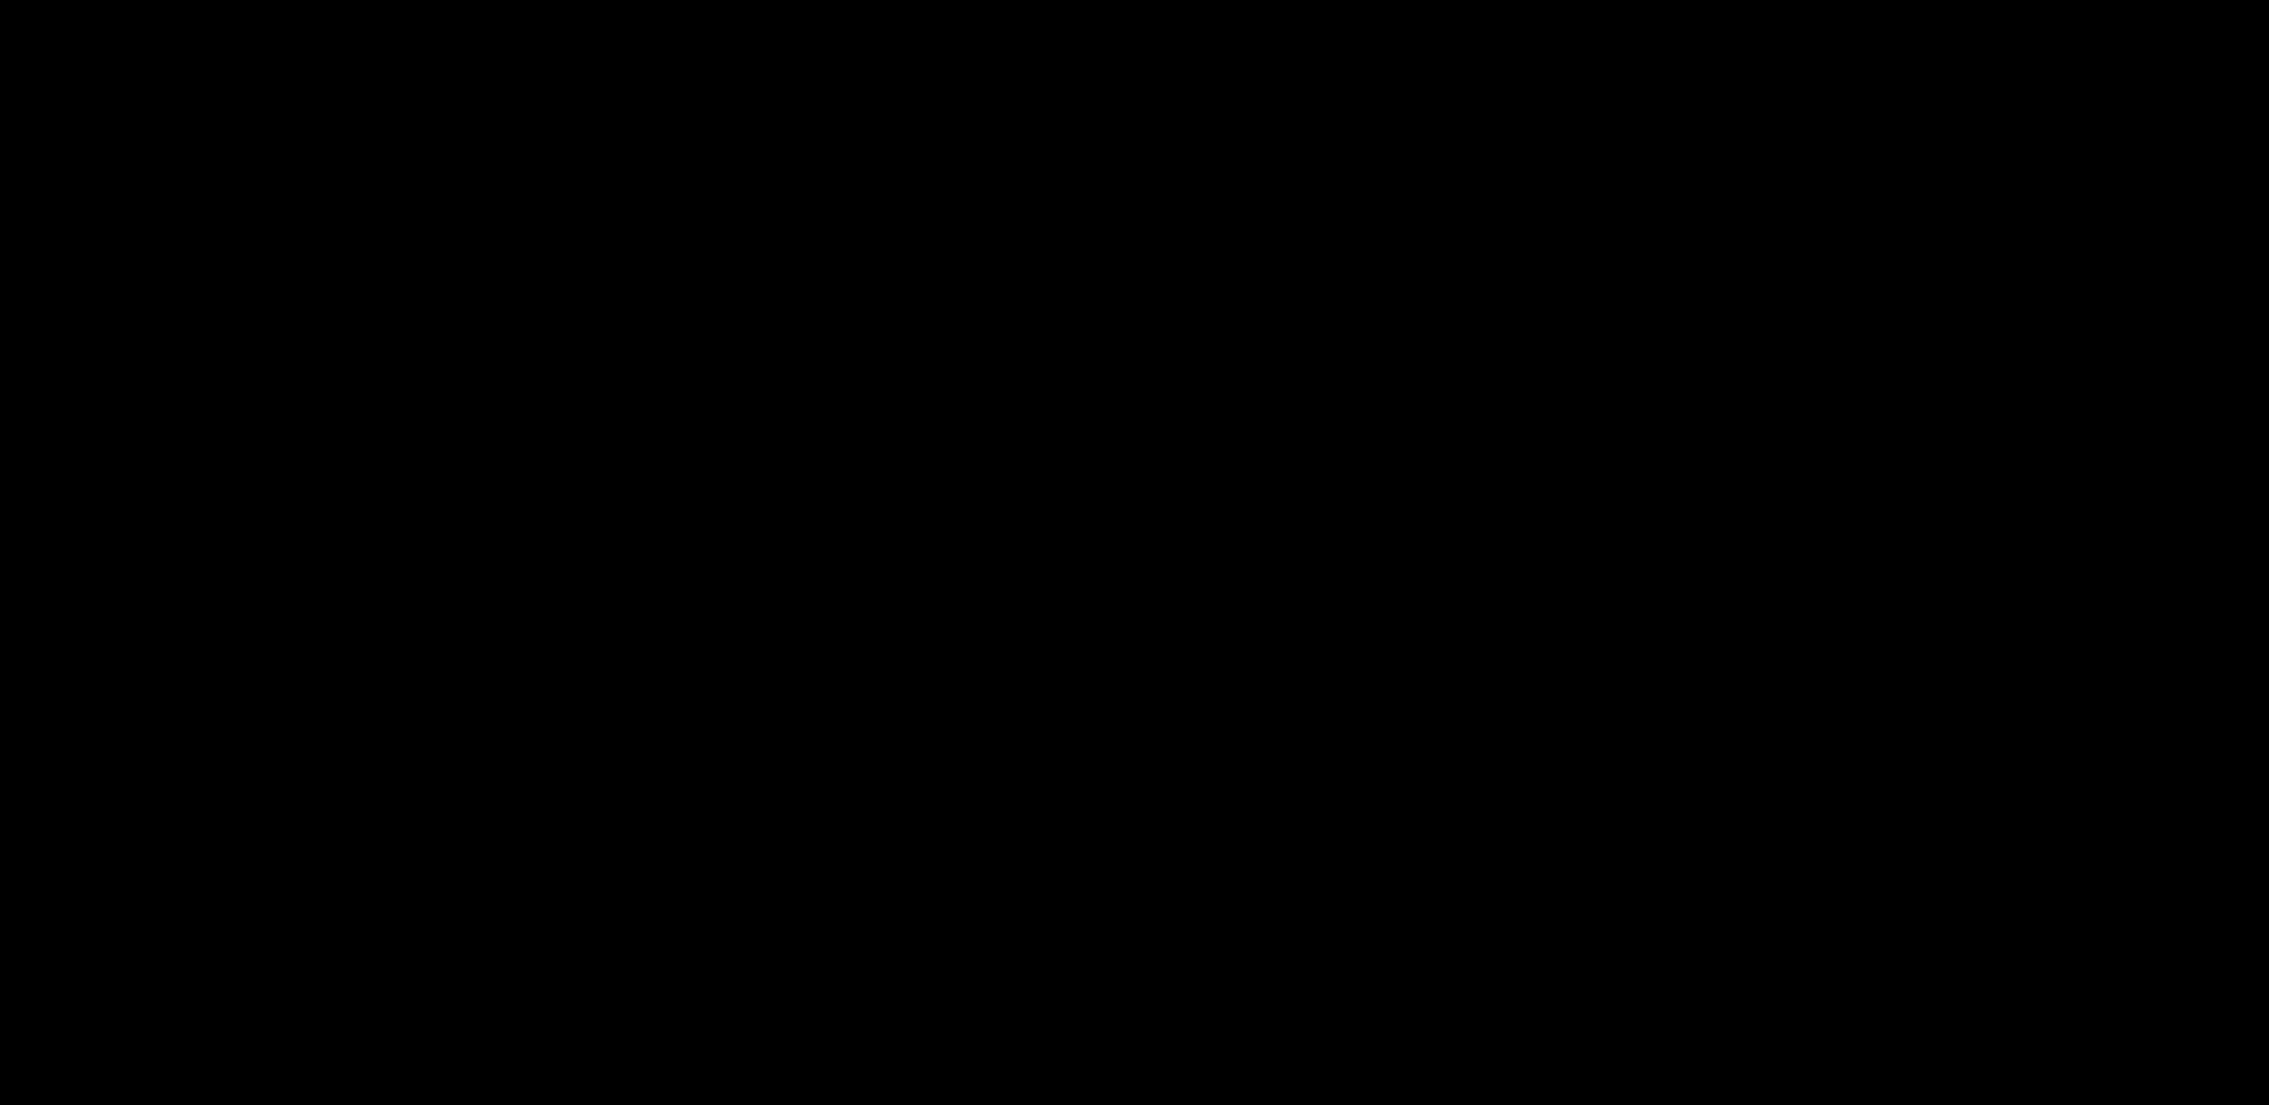 Medium Image - Eye Contact Png (2269x1105)